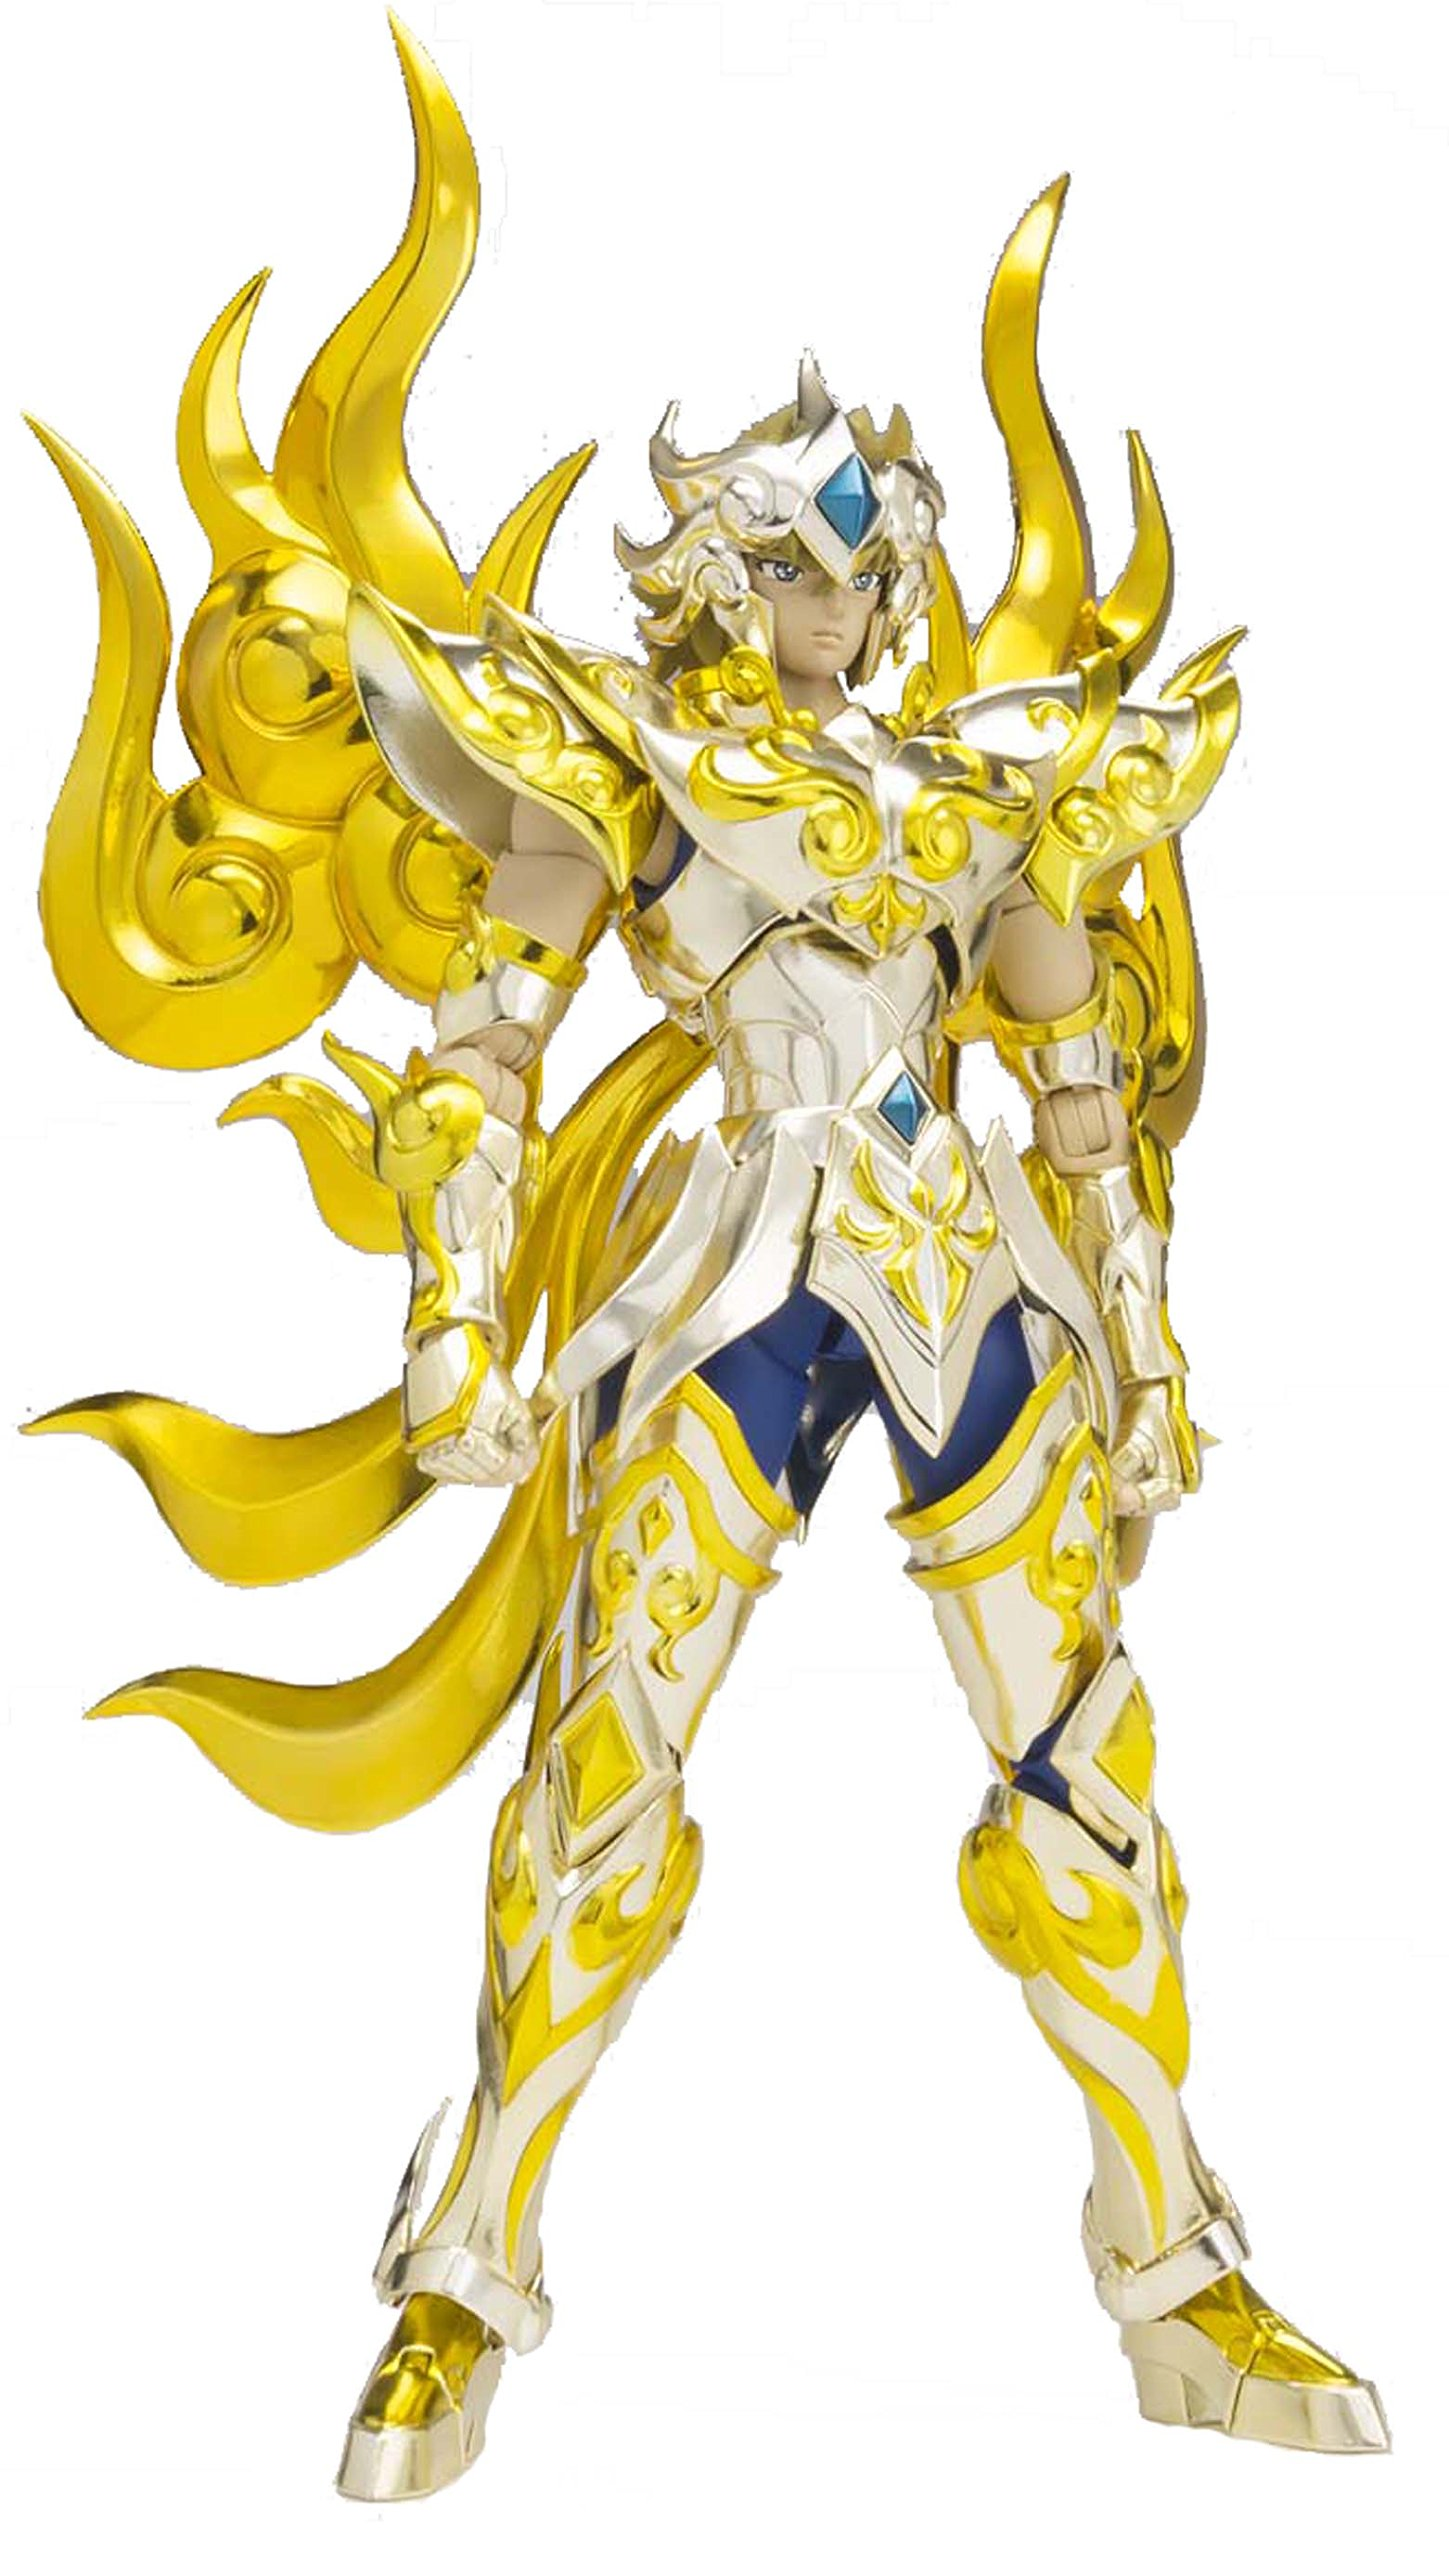 Tamashii Nations Bandai Saint Cloth Myth EX Leo Aioloa God Cloth Saint Seya Action Figure